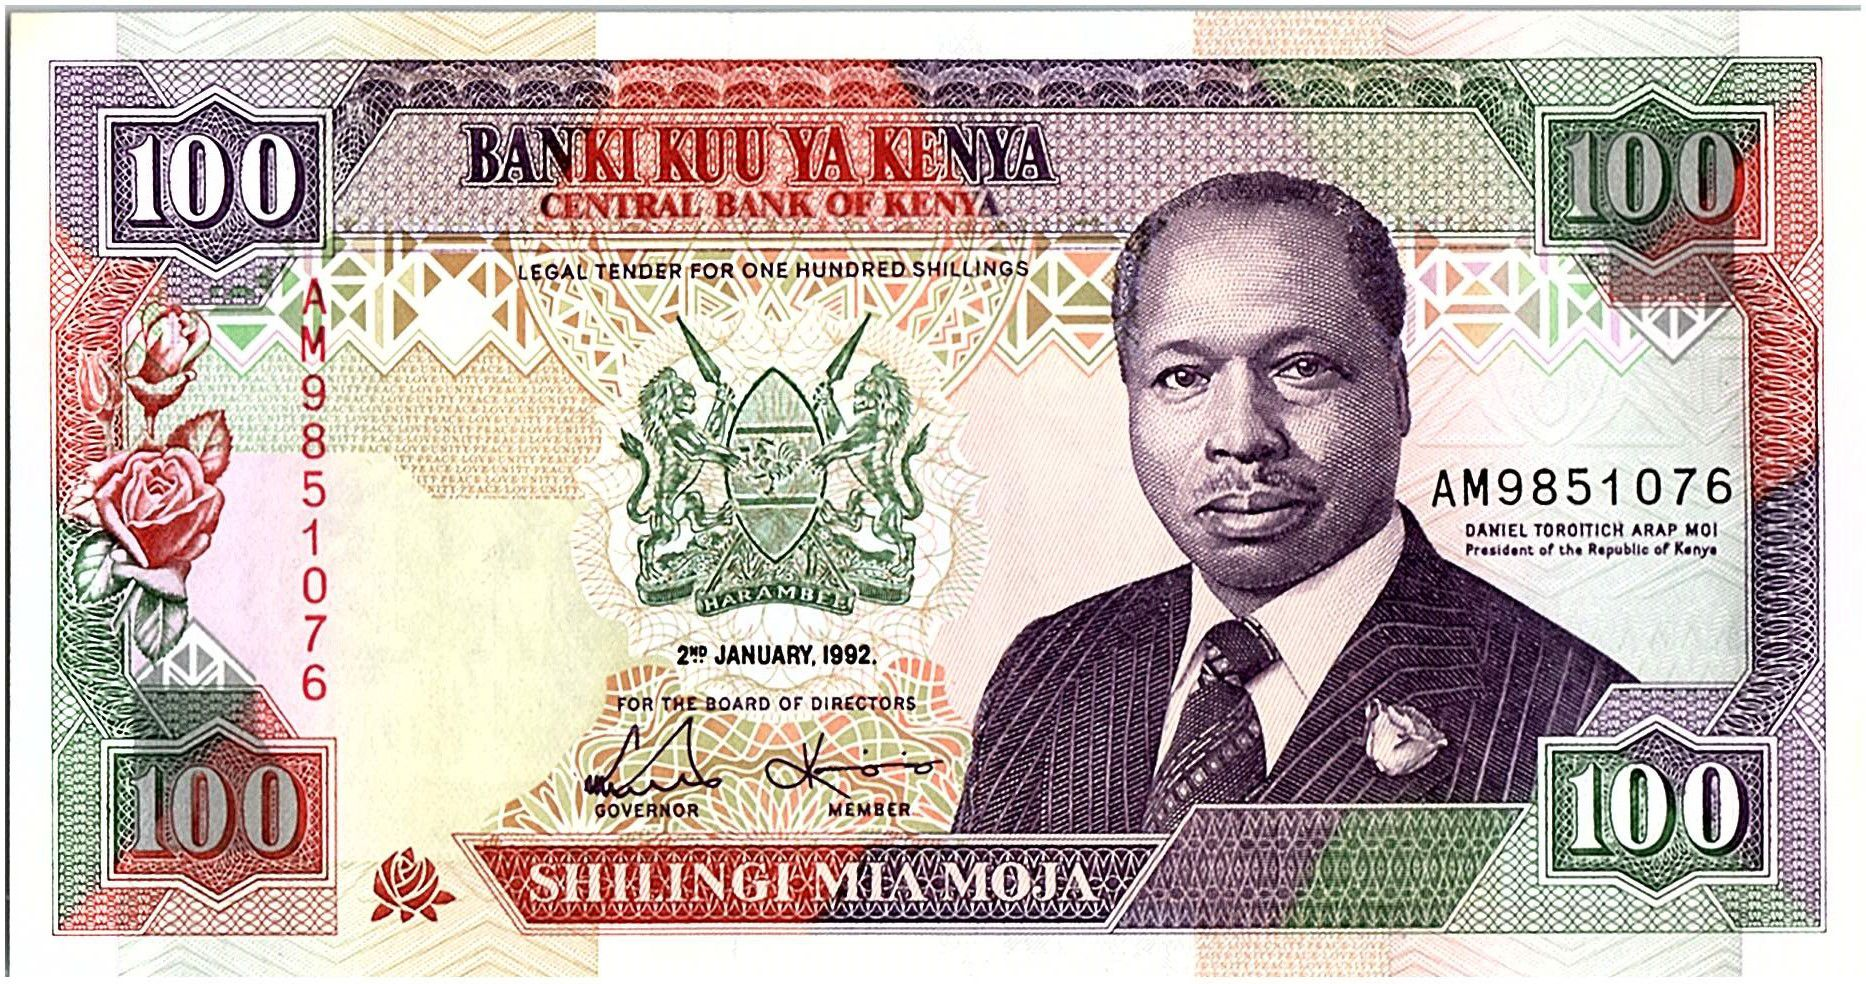 Kenya 100 Shillings  - Daniel Toroitich Arap Moi -1992